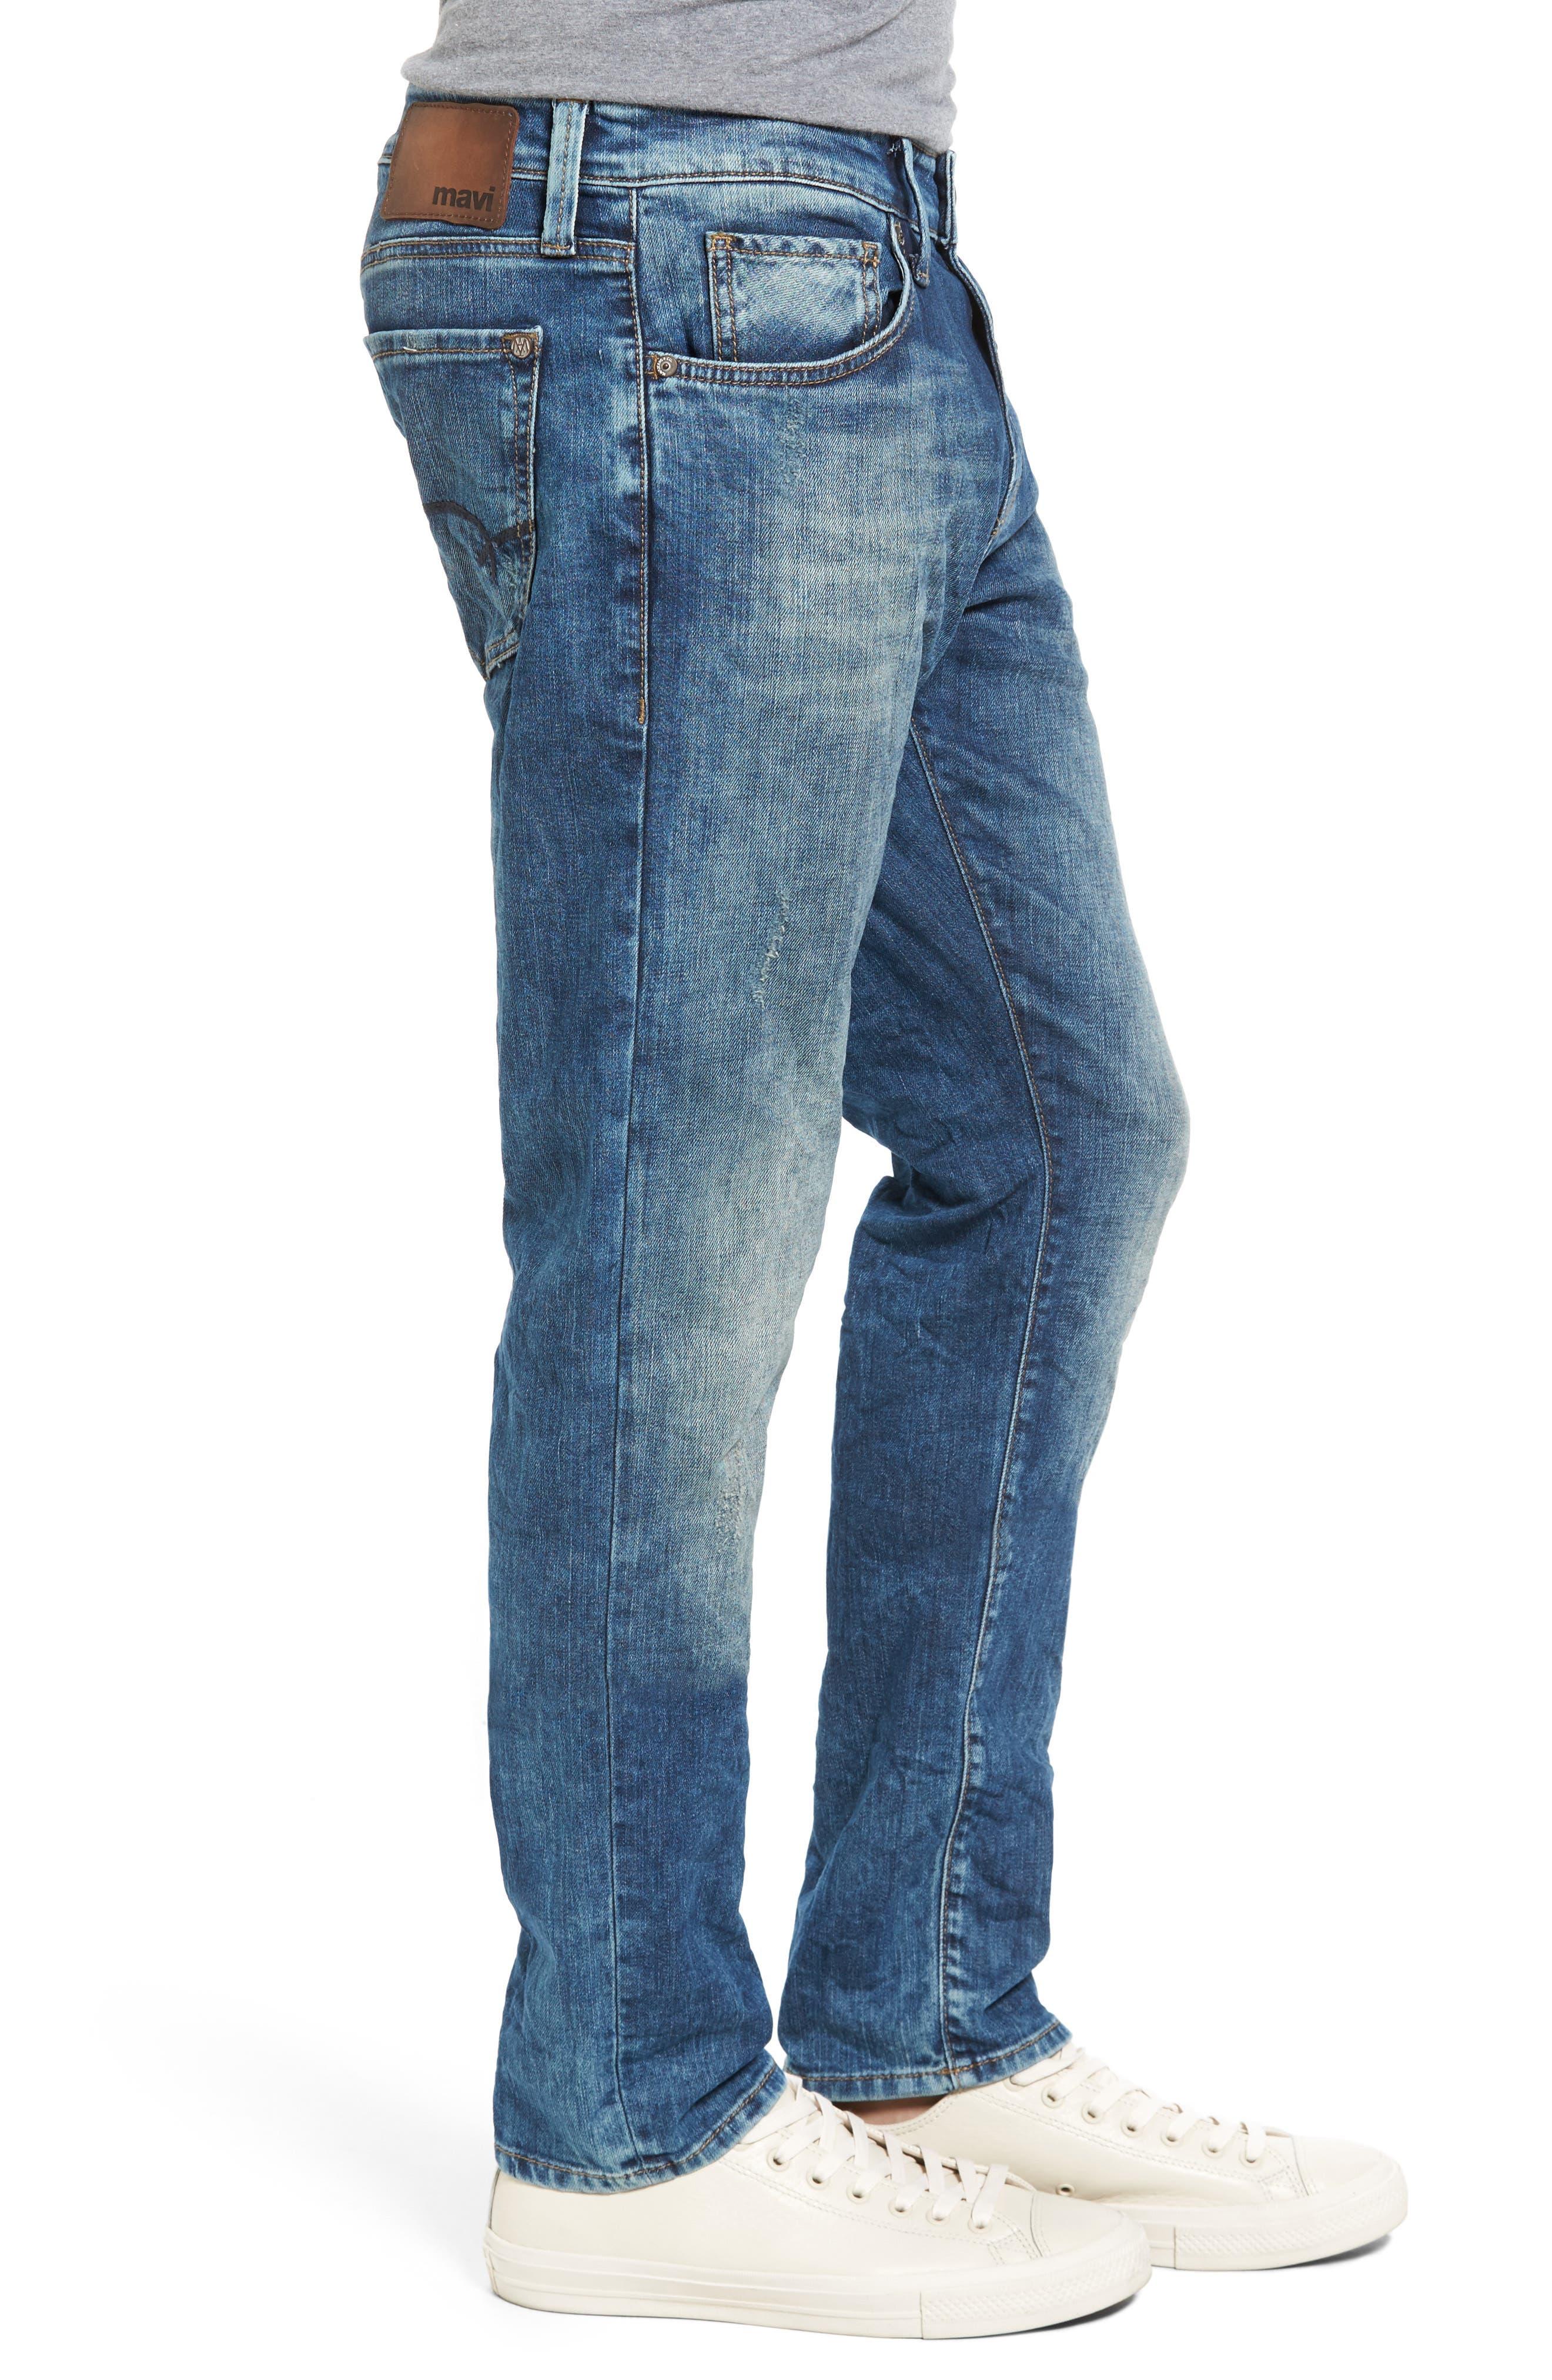 Jake Easy Slim Fit Jeans,                             Alternate thumbnail 3, color,                             420